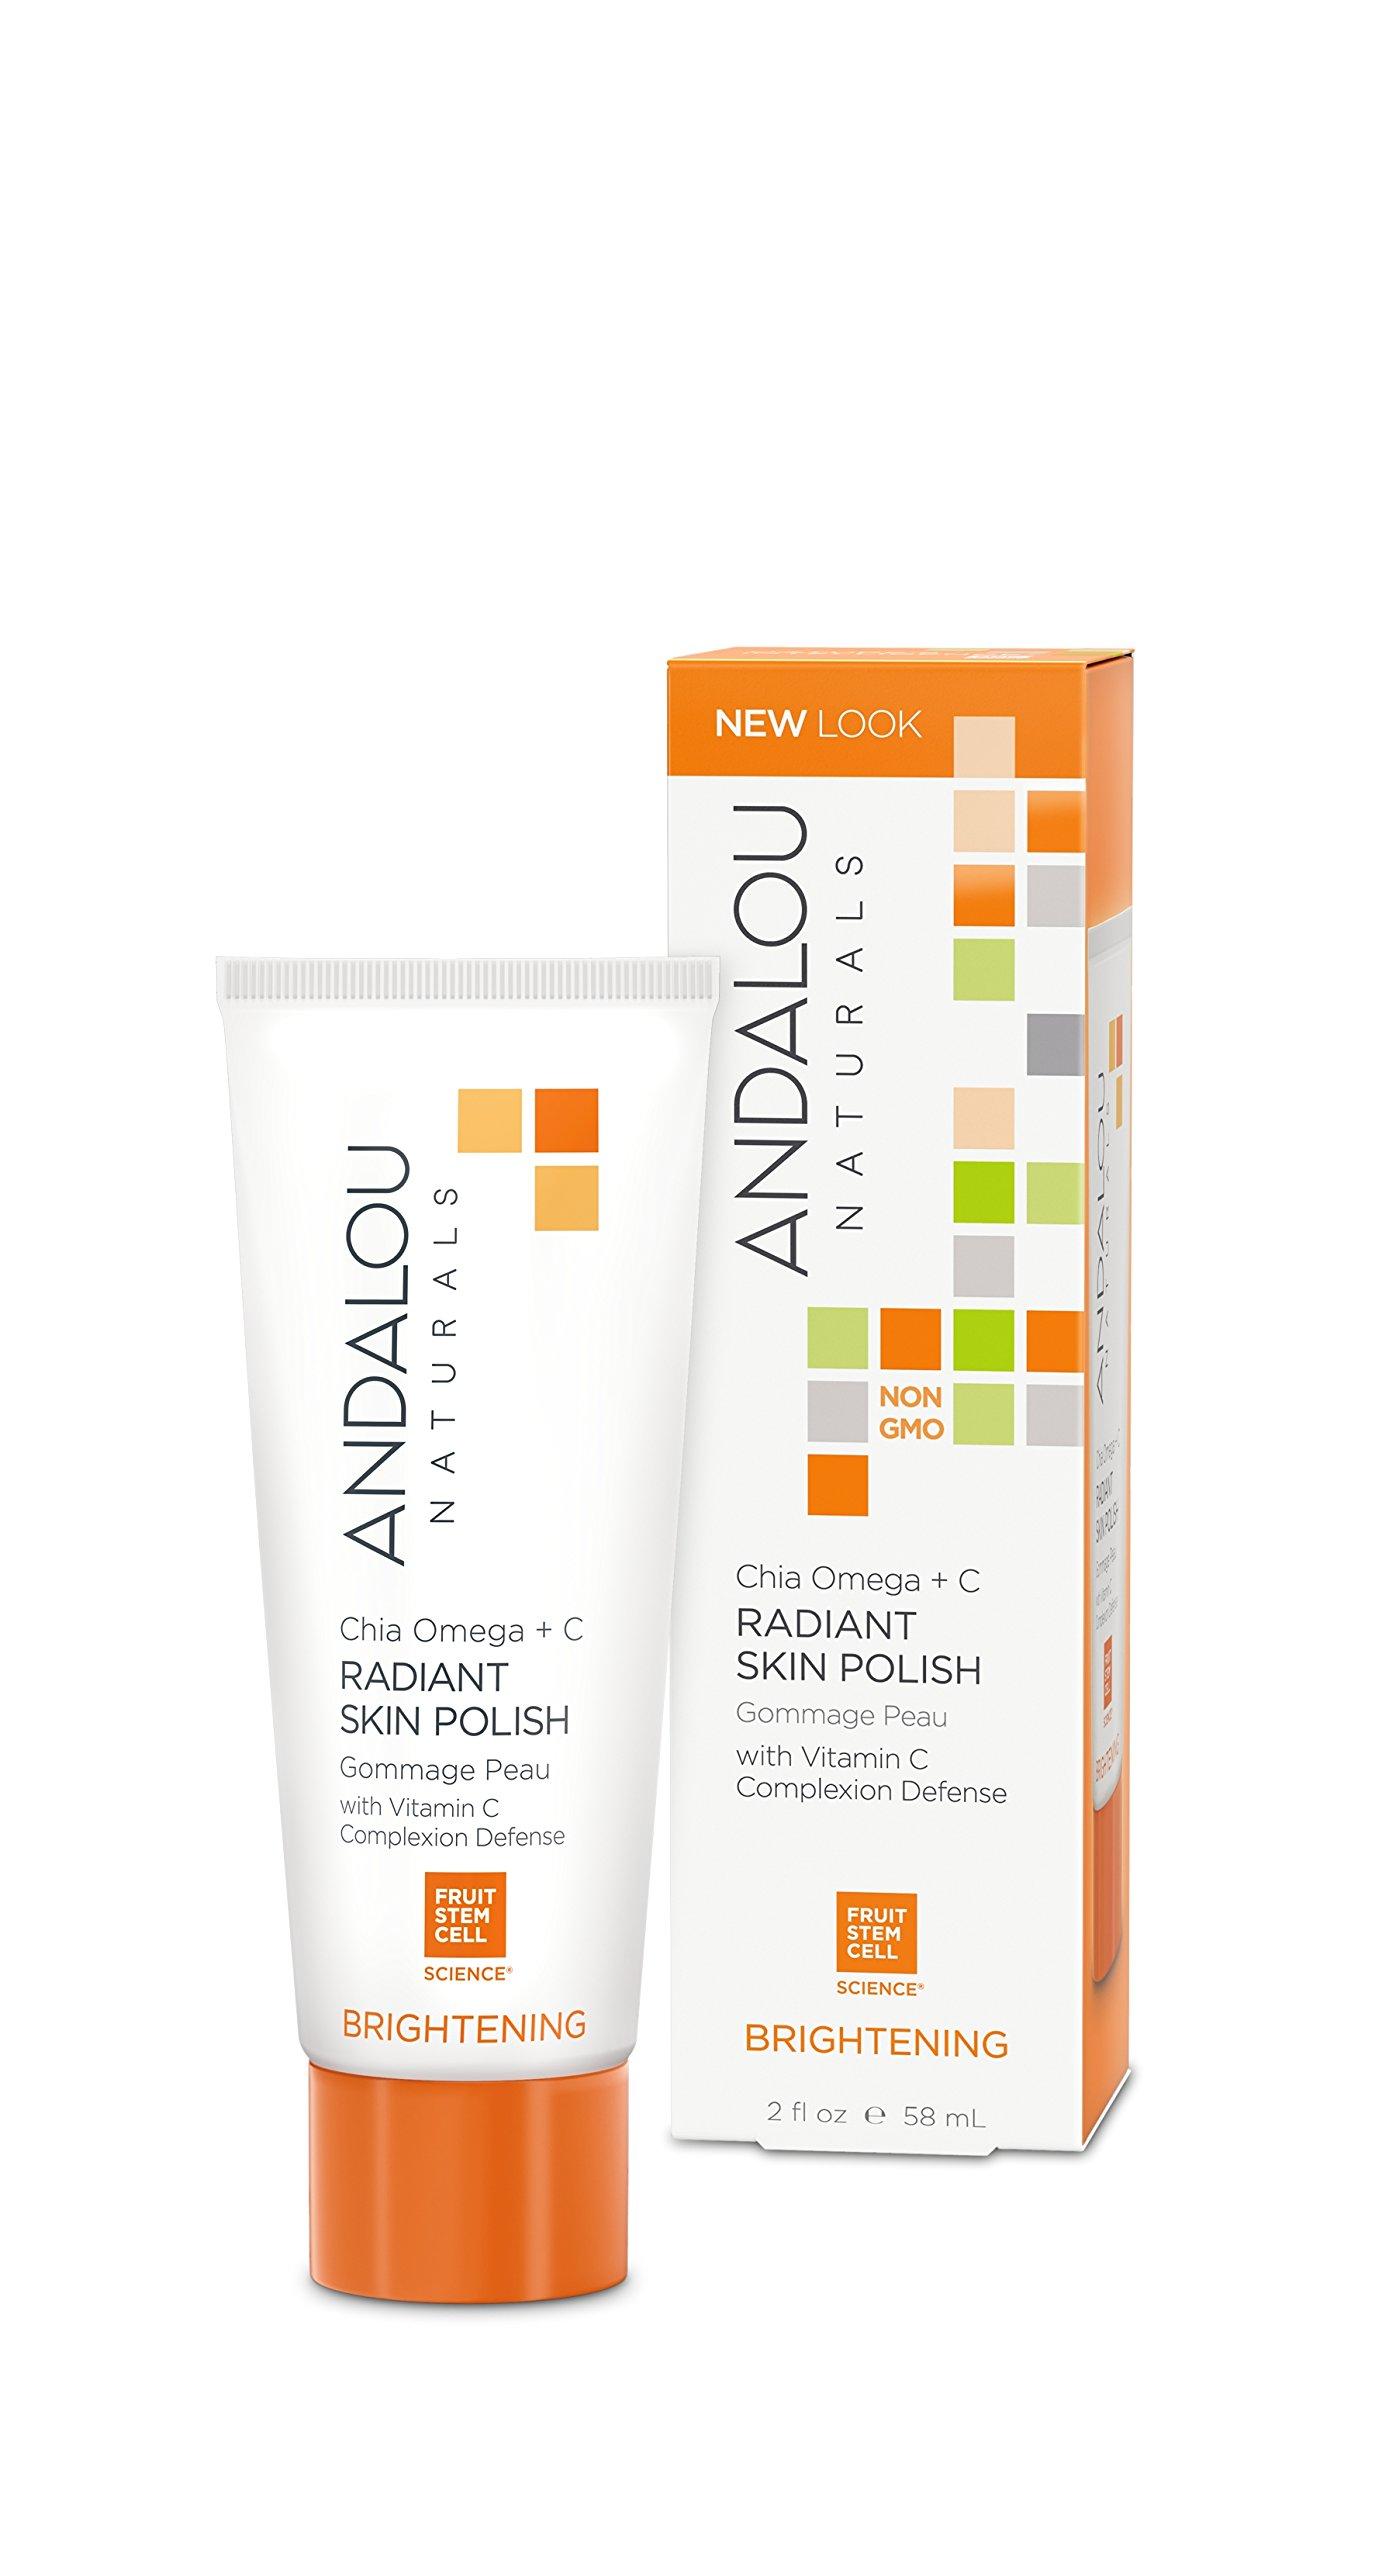 Andalou Naturals Chia Omega + C Radiant Skin Polish, 2 Ounce Tube by Andalou Naturals